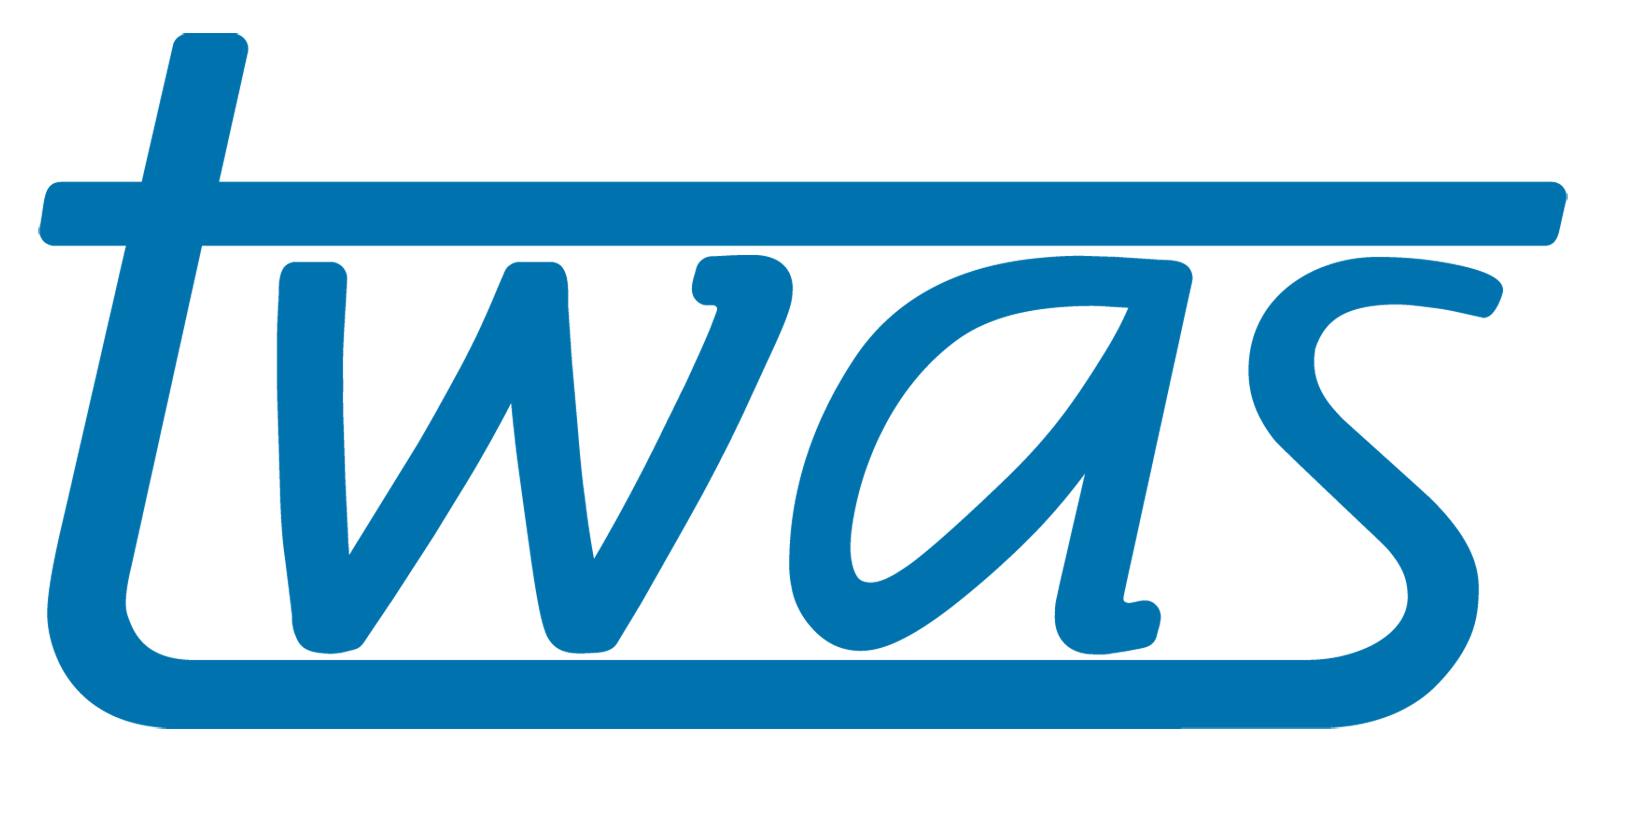 TWAS Siwei Cheng Award in Economic Sciences 2020 (Prize of US$10,000)